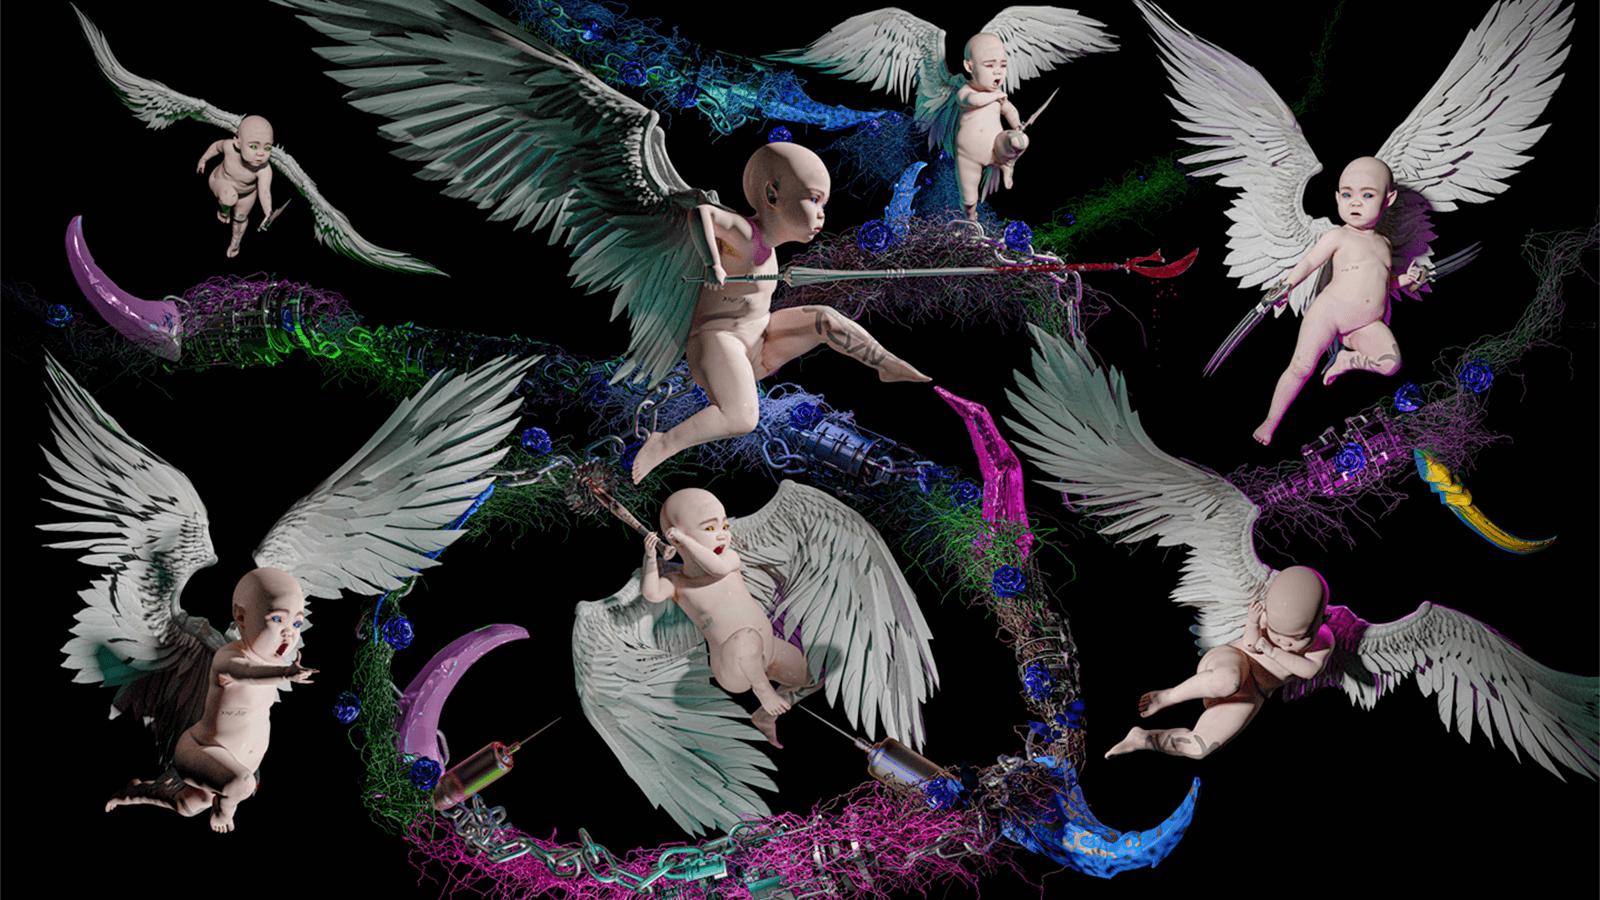 Grimes's NFT Digital Art